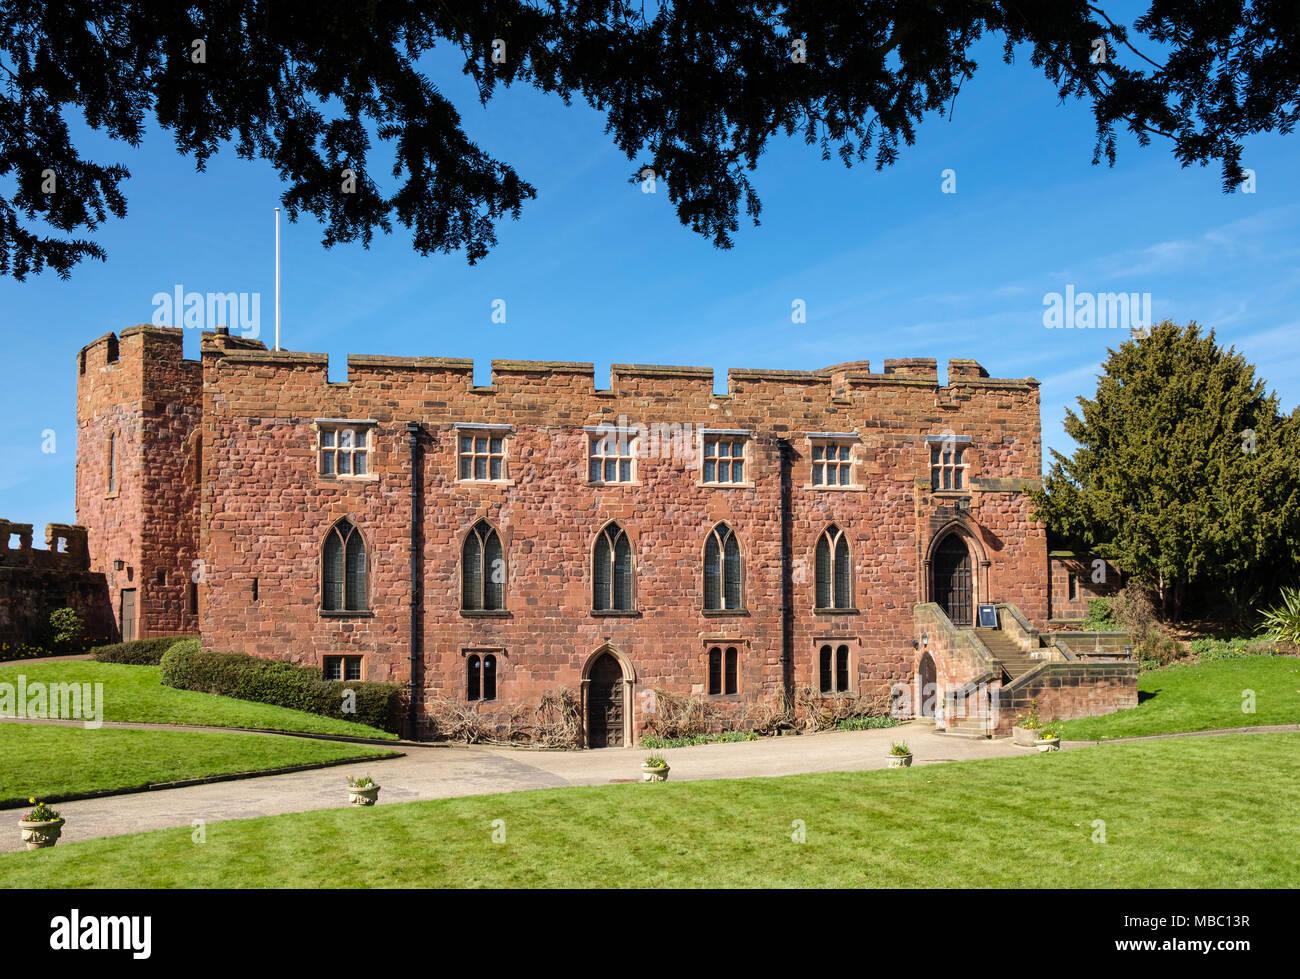 The Shropshire Regimental Museum in the medieval 11th century red-brick Castle. Shrewsbury, Shropshire, West Midlands, England, UK, Britain - Stock Image